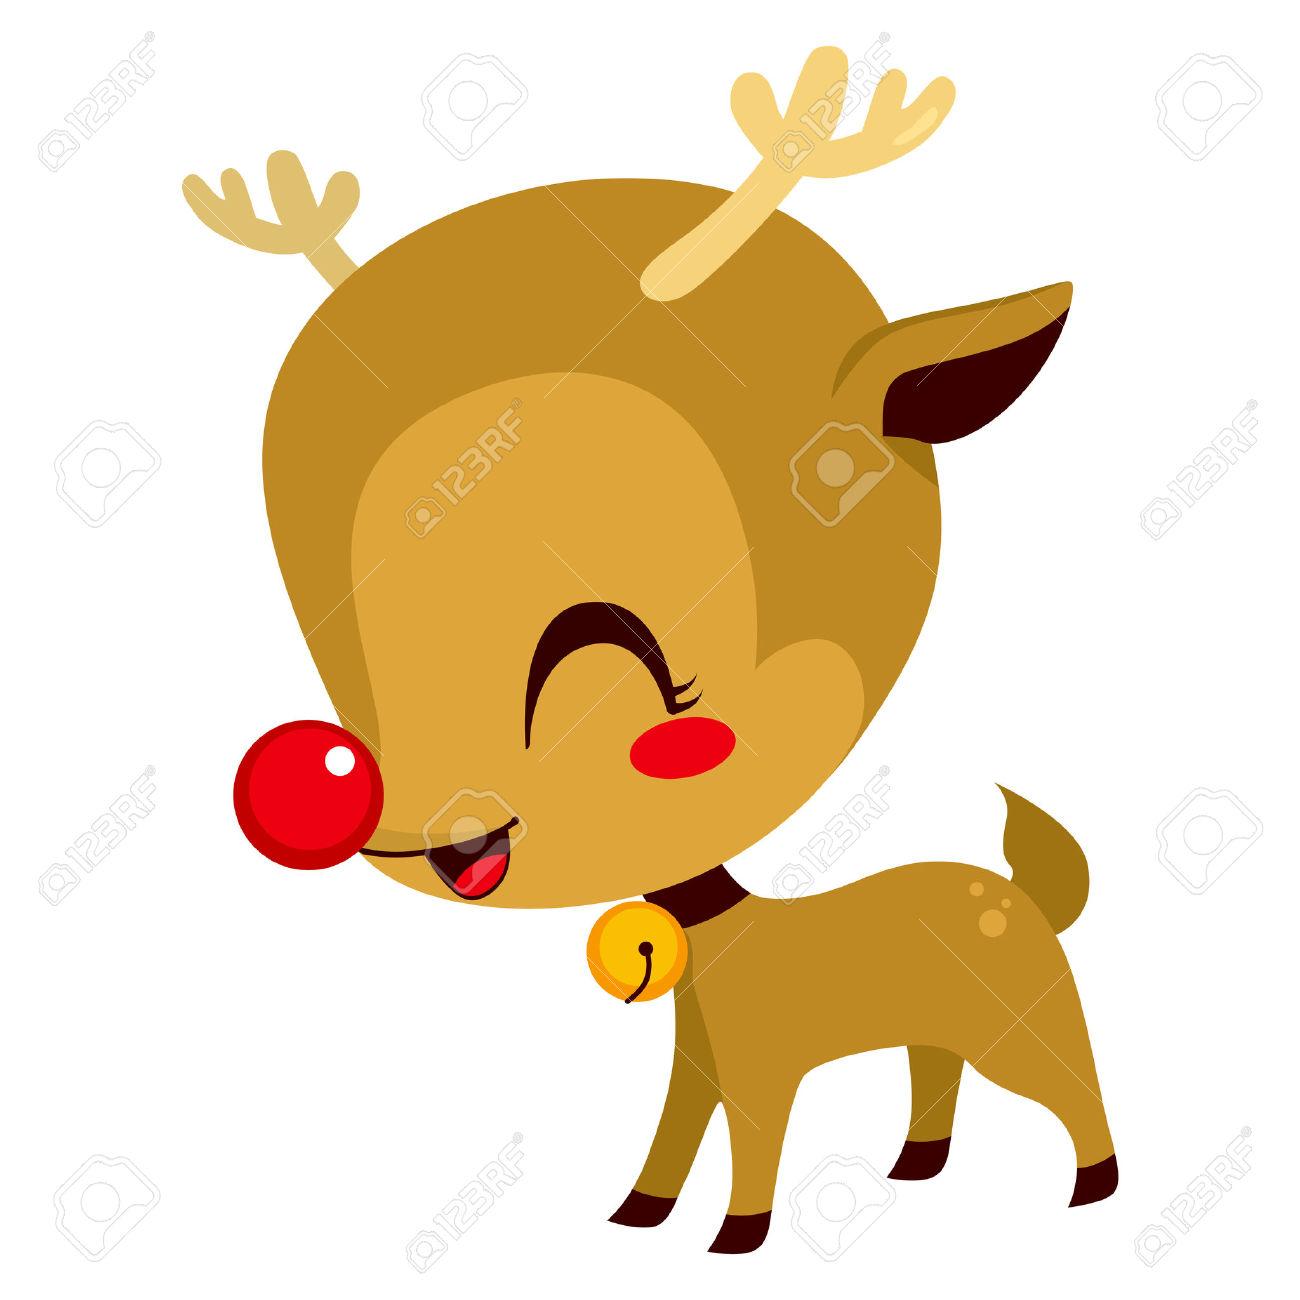 rudolph the red nose reindeer - Cute Reindeer Clipart